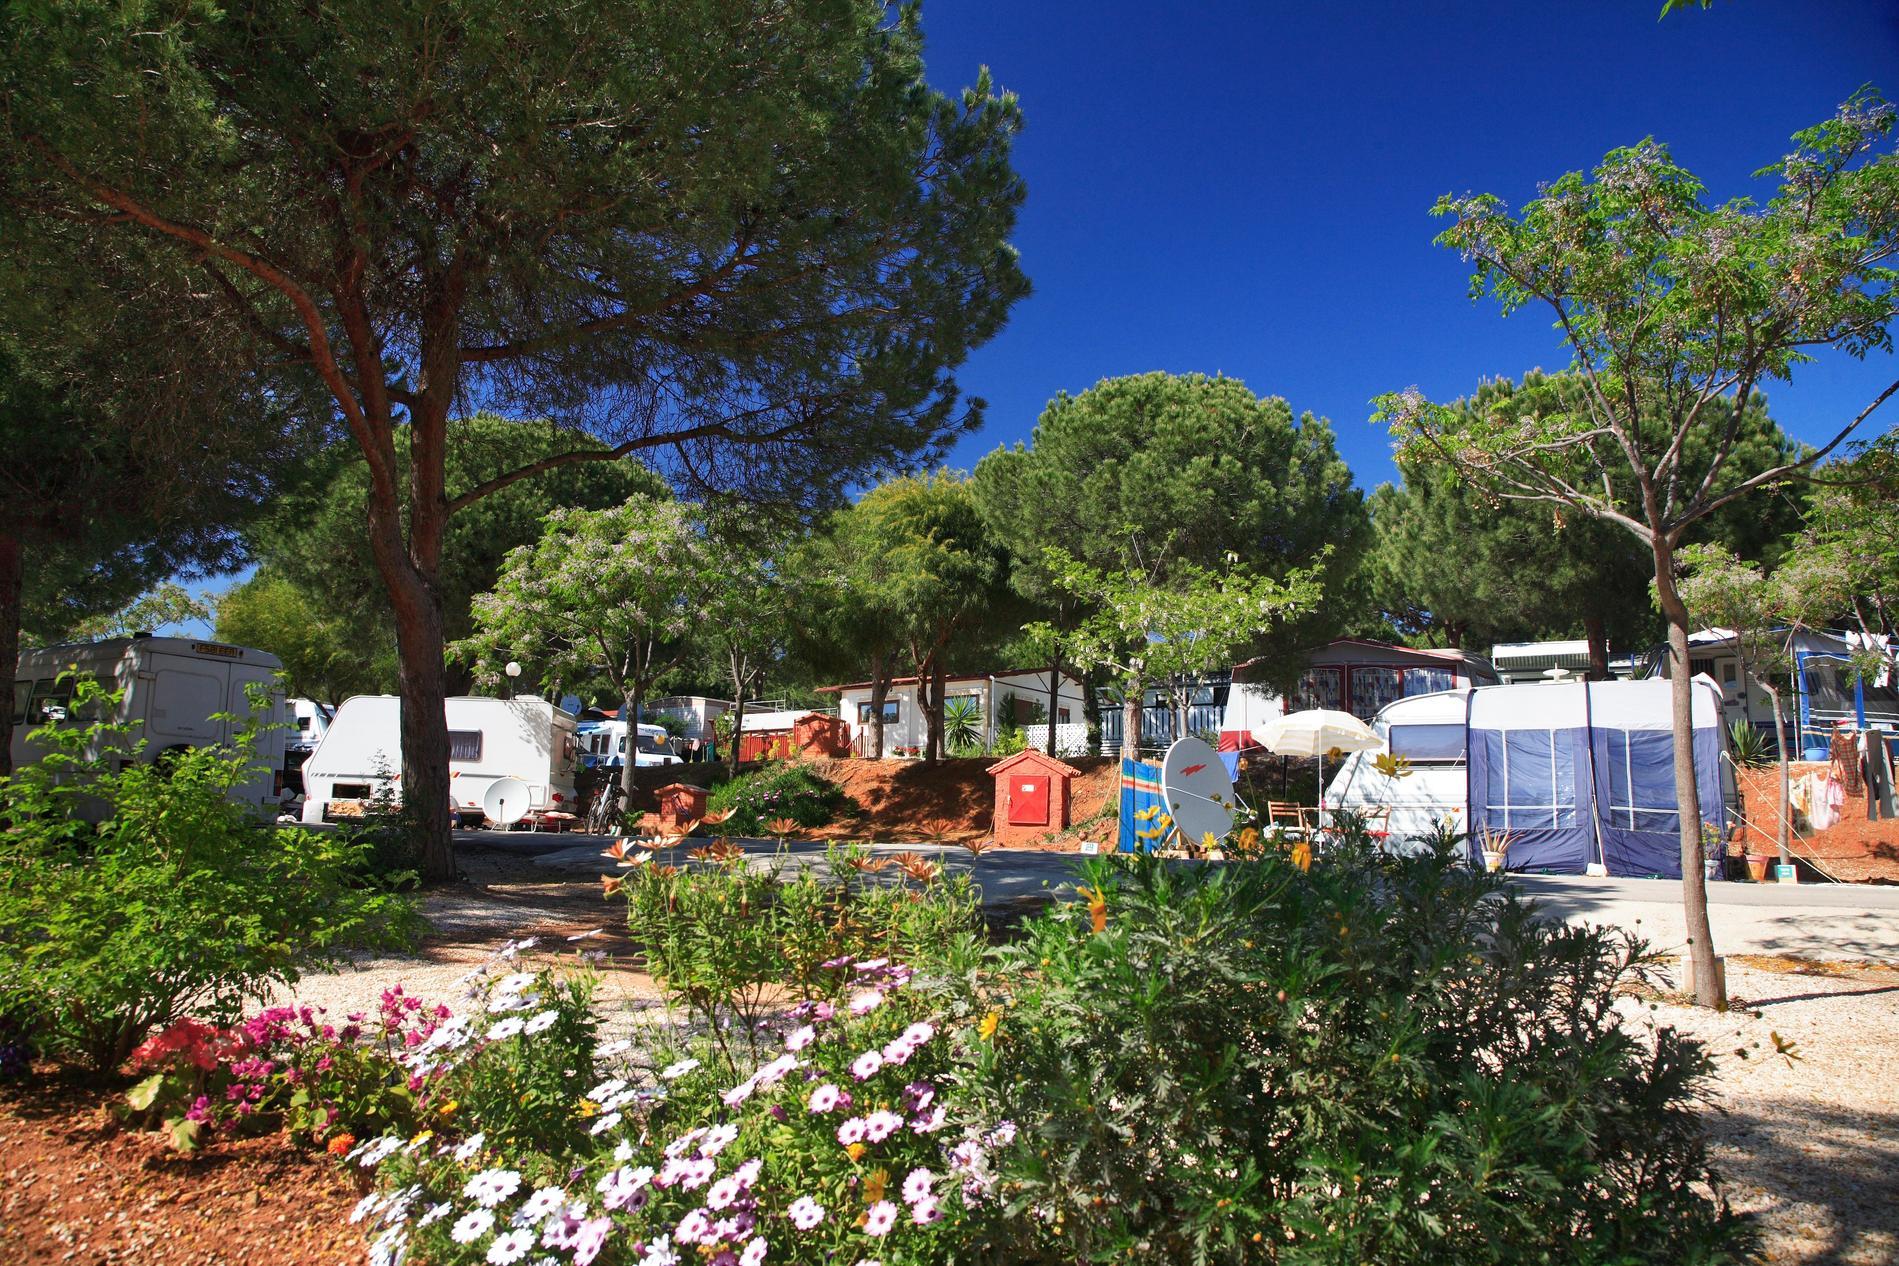 Spanje-Marbella-Camping%20Cabopino-ExtraLarge Zonvakanties Spanje Pagina 3 van 39